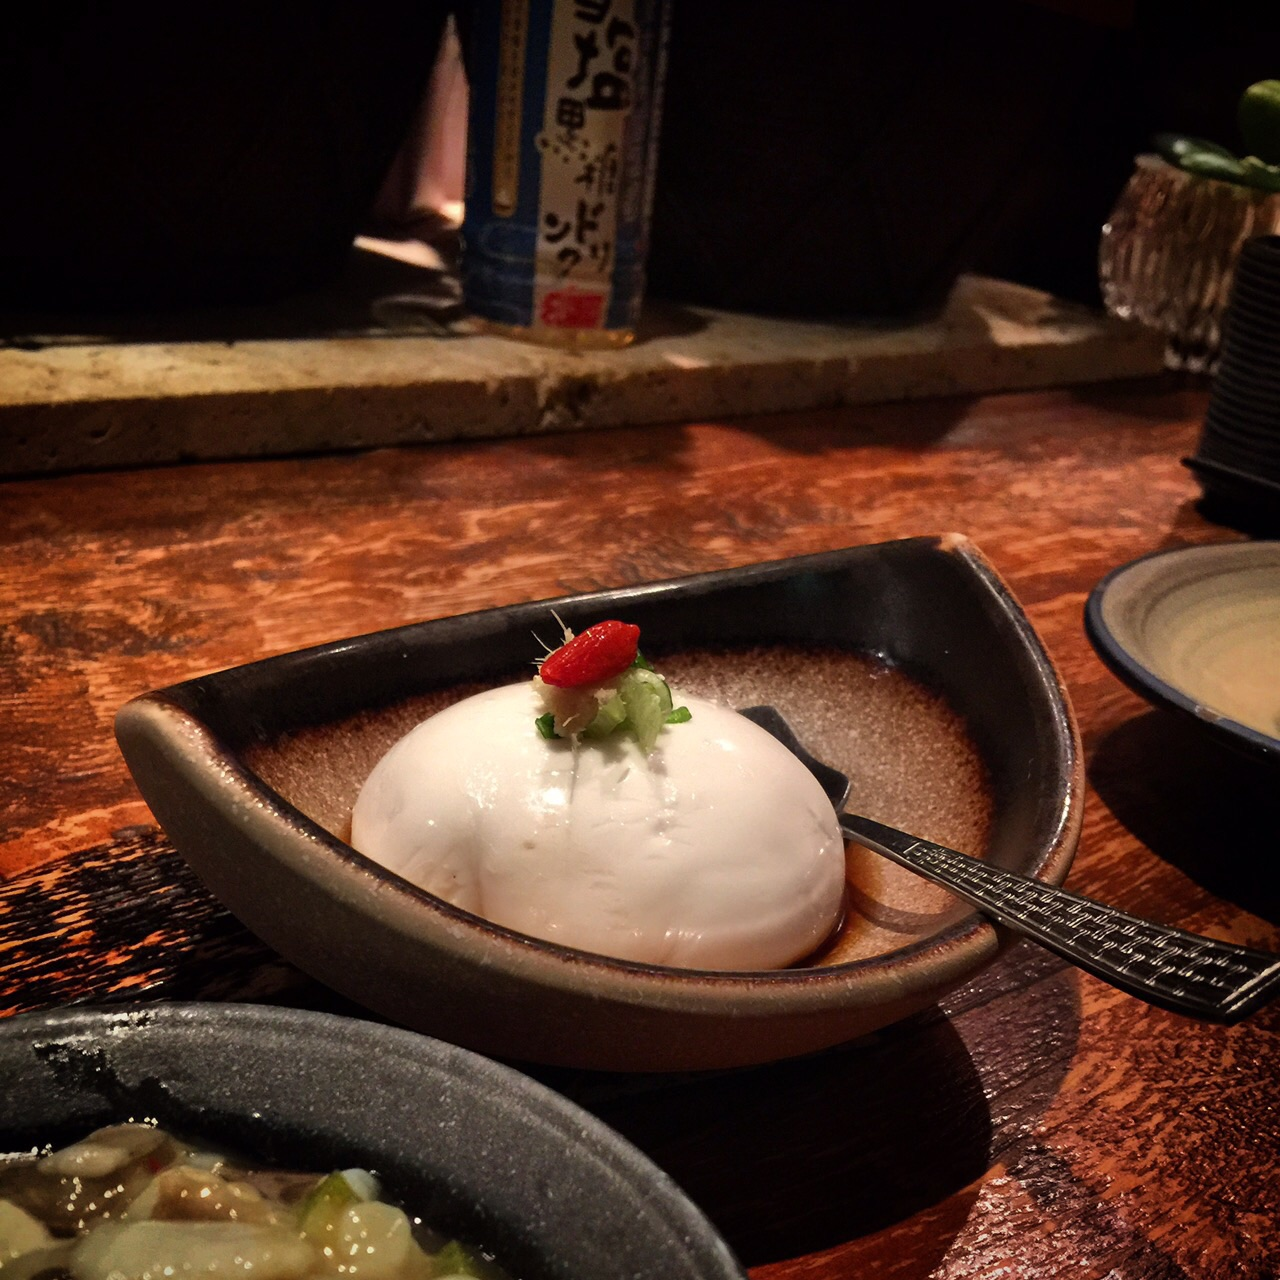 rakuen japanese restaurant okinawa food hong kong homemade peanut sauce tofu